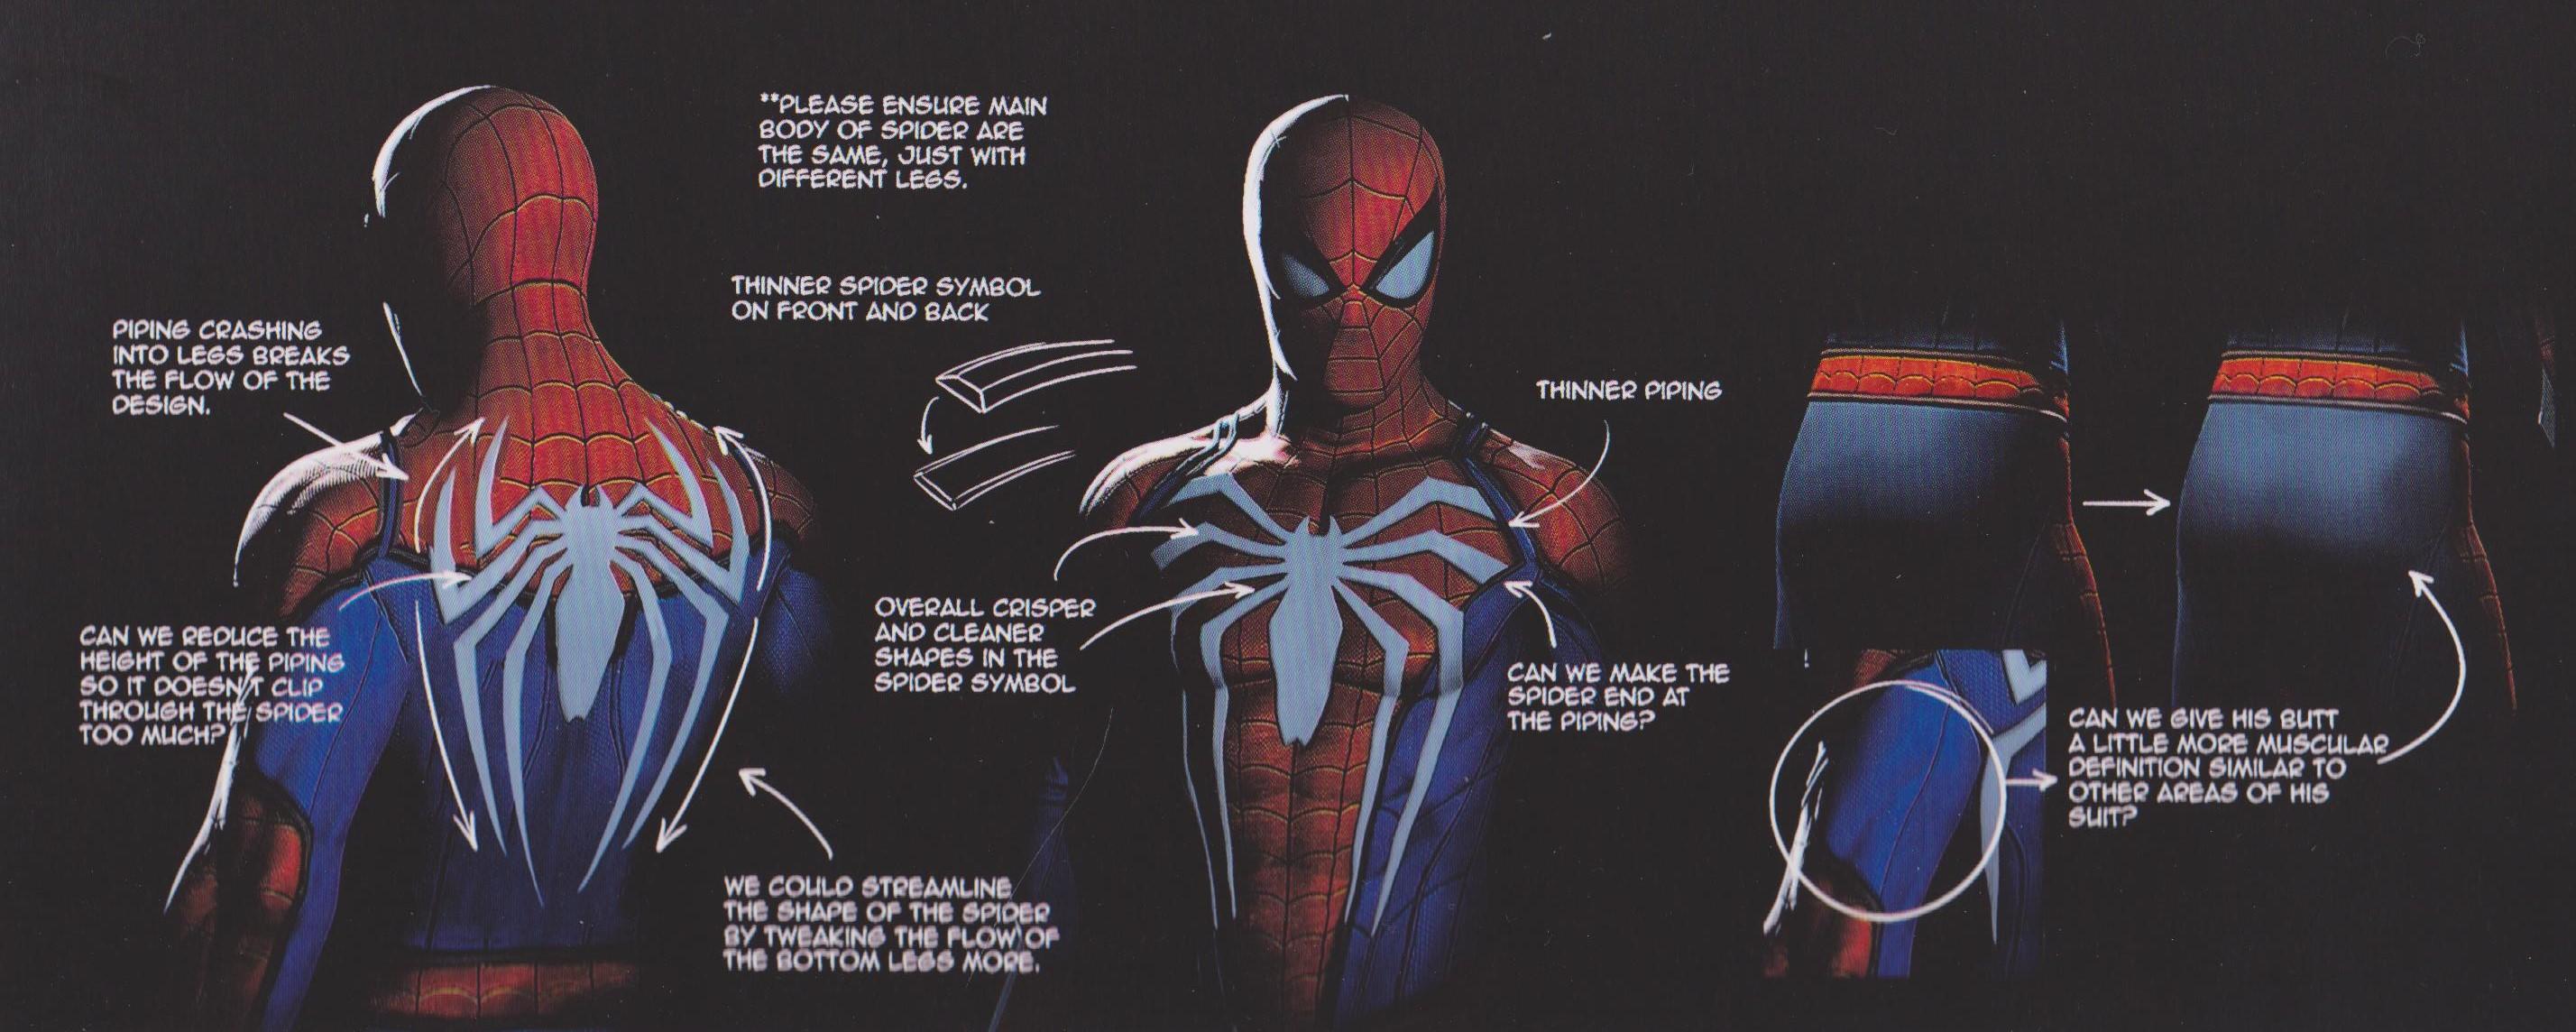 SPIDER,MAN PS4 Concept Art Reveals Alternate Designs For The